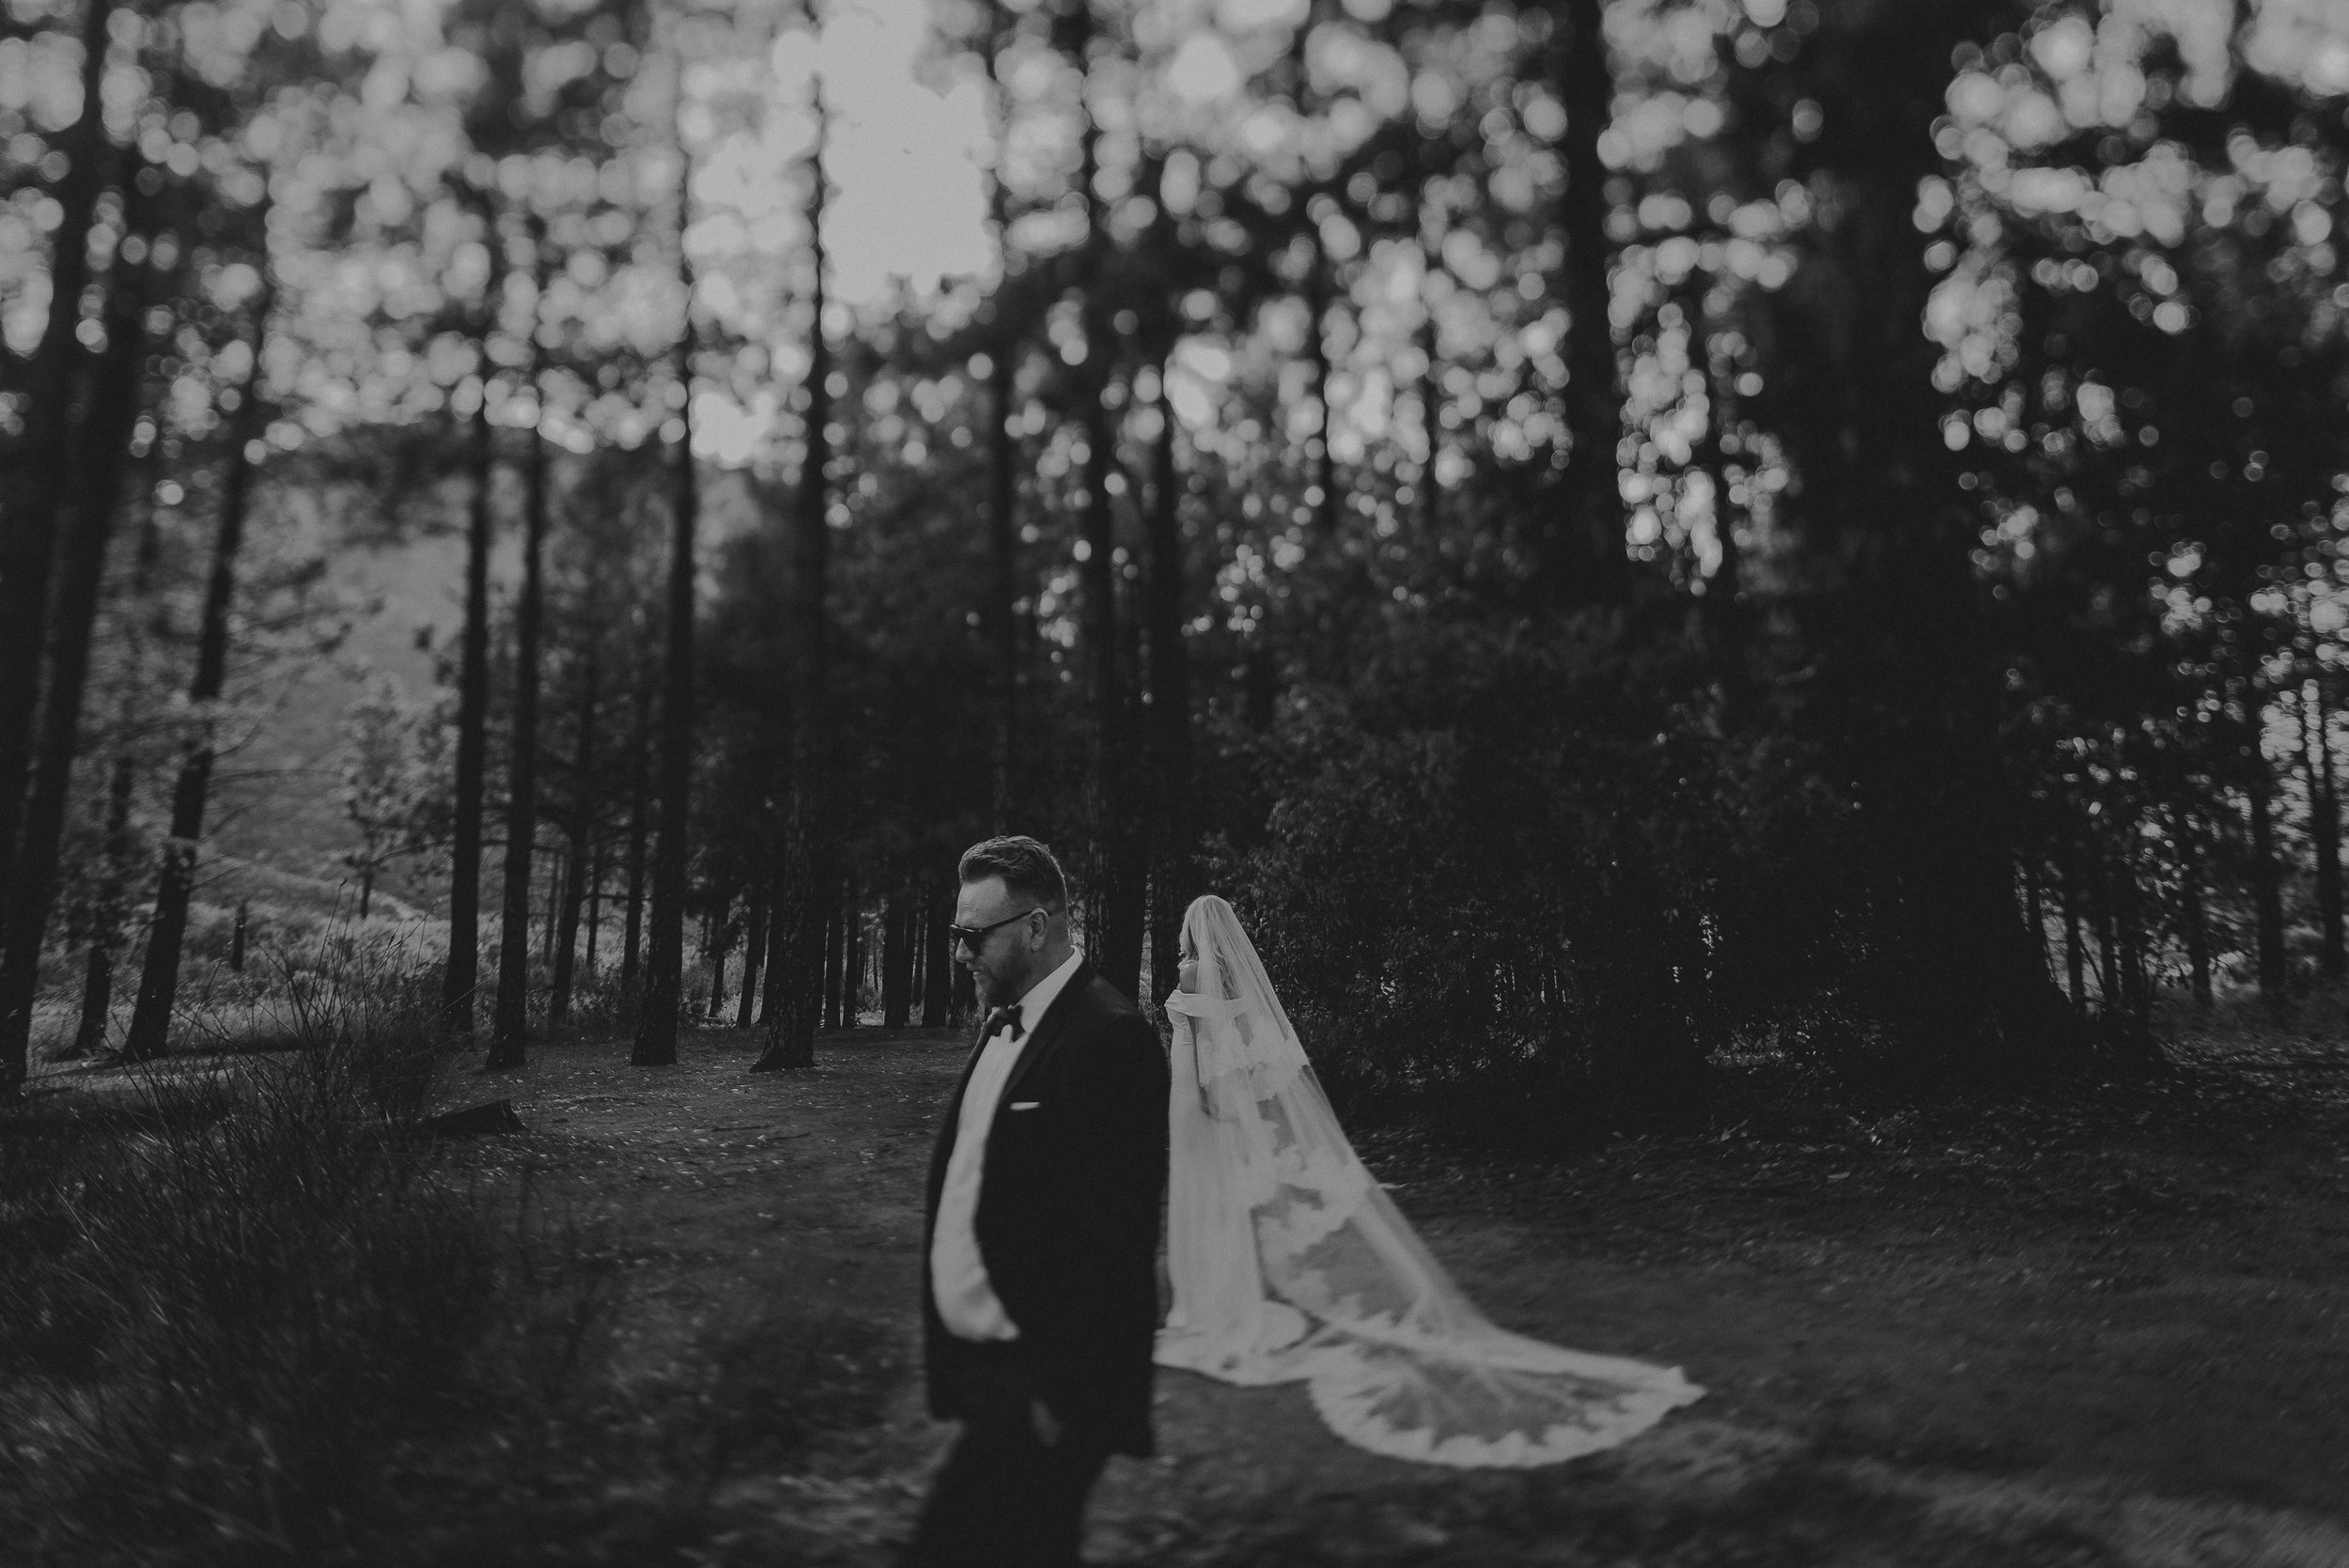 Isaiah + Taylor Photography - Amy + Cole Wedding - Slideshow-105.jpg